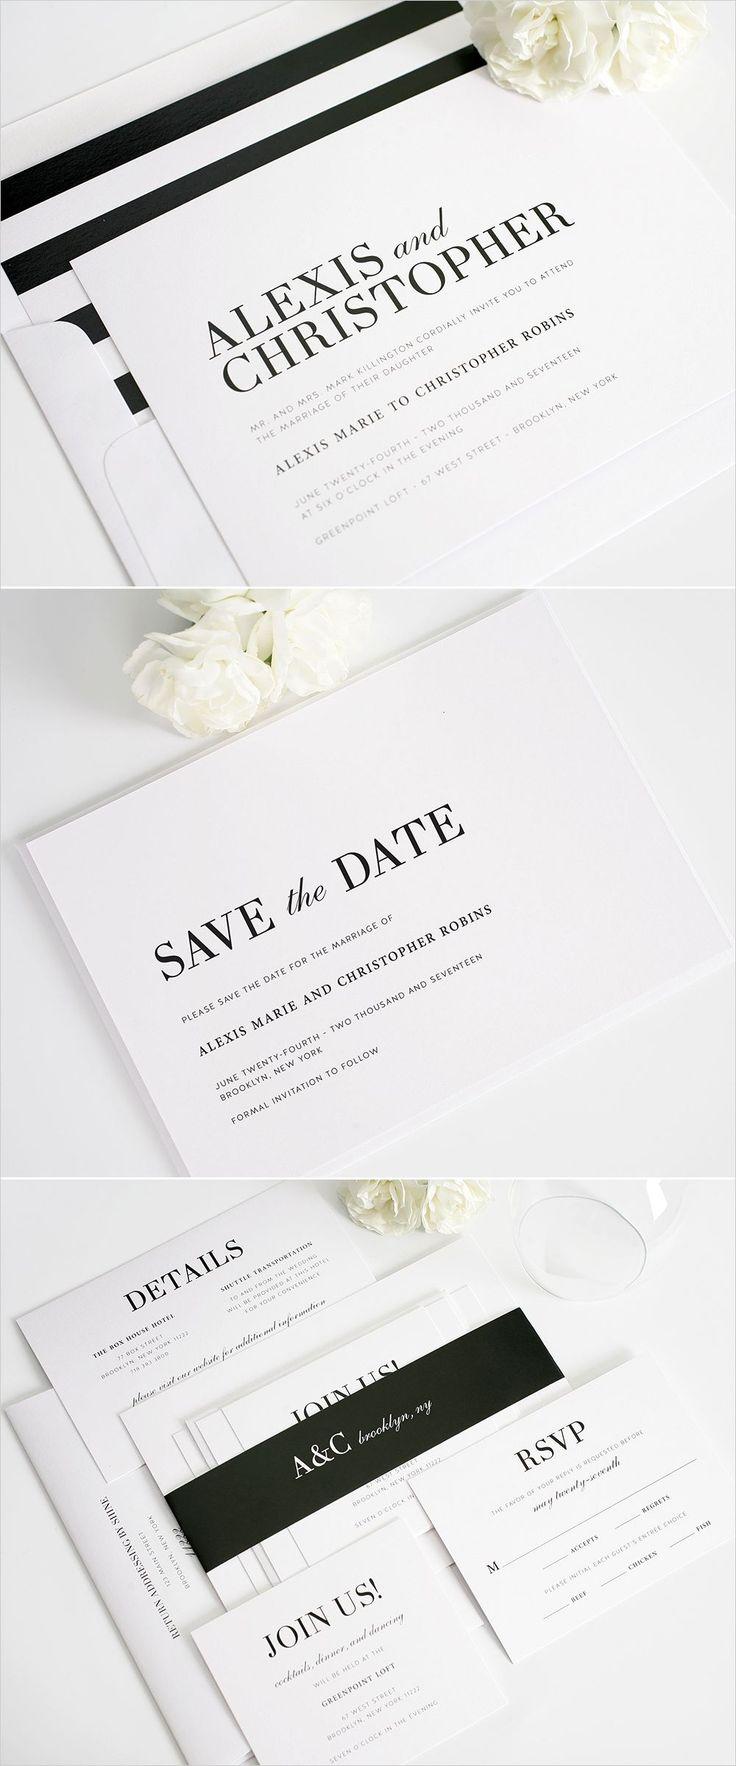 Urban glamour wedding invitations from Shine Wedding Invitations http://www.shineweddinginvitations.com/wedding-invitations/urban-glamour-wedding-invitations